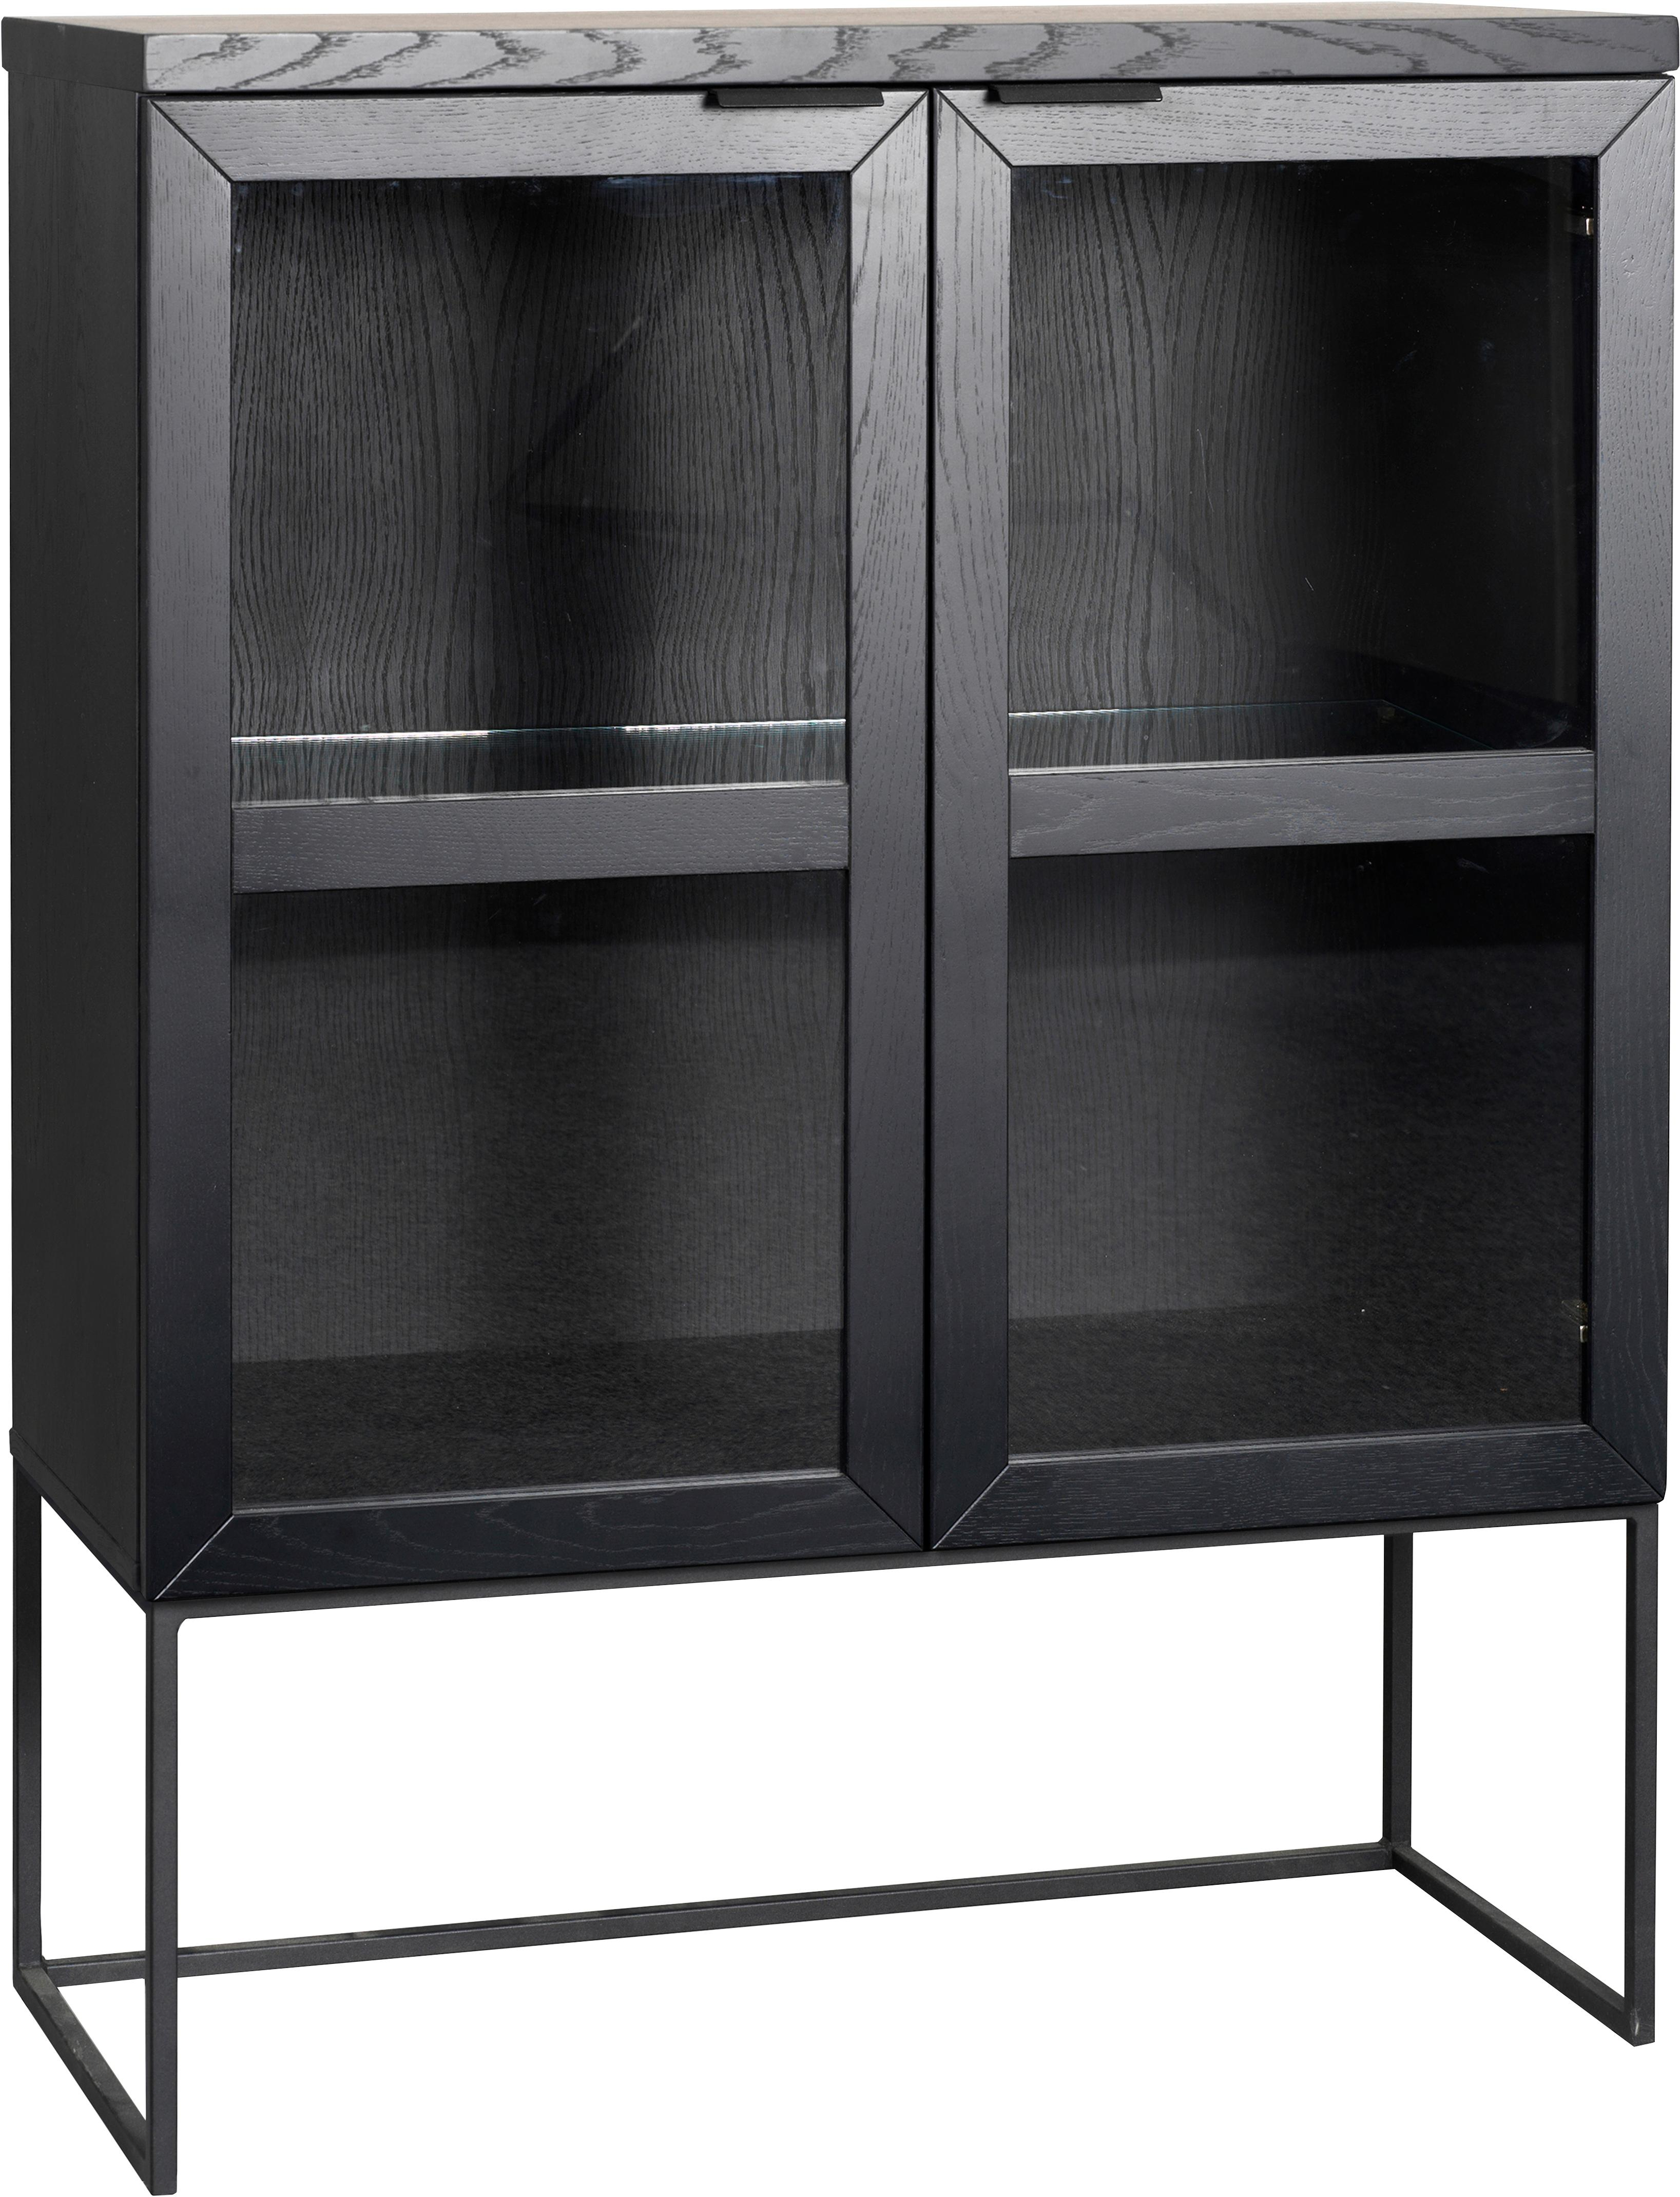 Dressoir Everett met glazen deuren in zwart, Frame: eikenhout, massief, gelak, Frame: gelakt metaal, Zwart, 95 x 125 cm